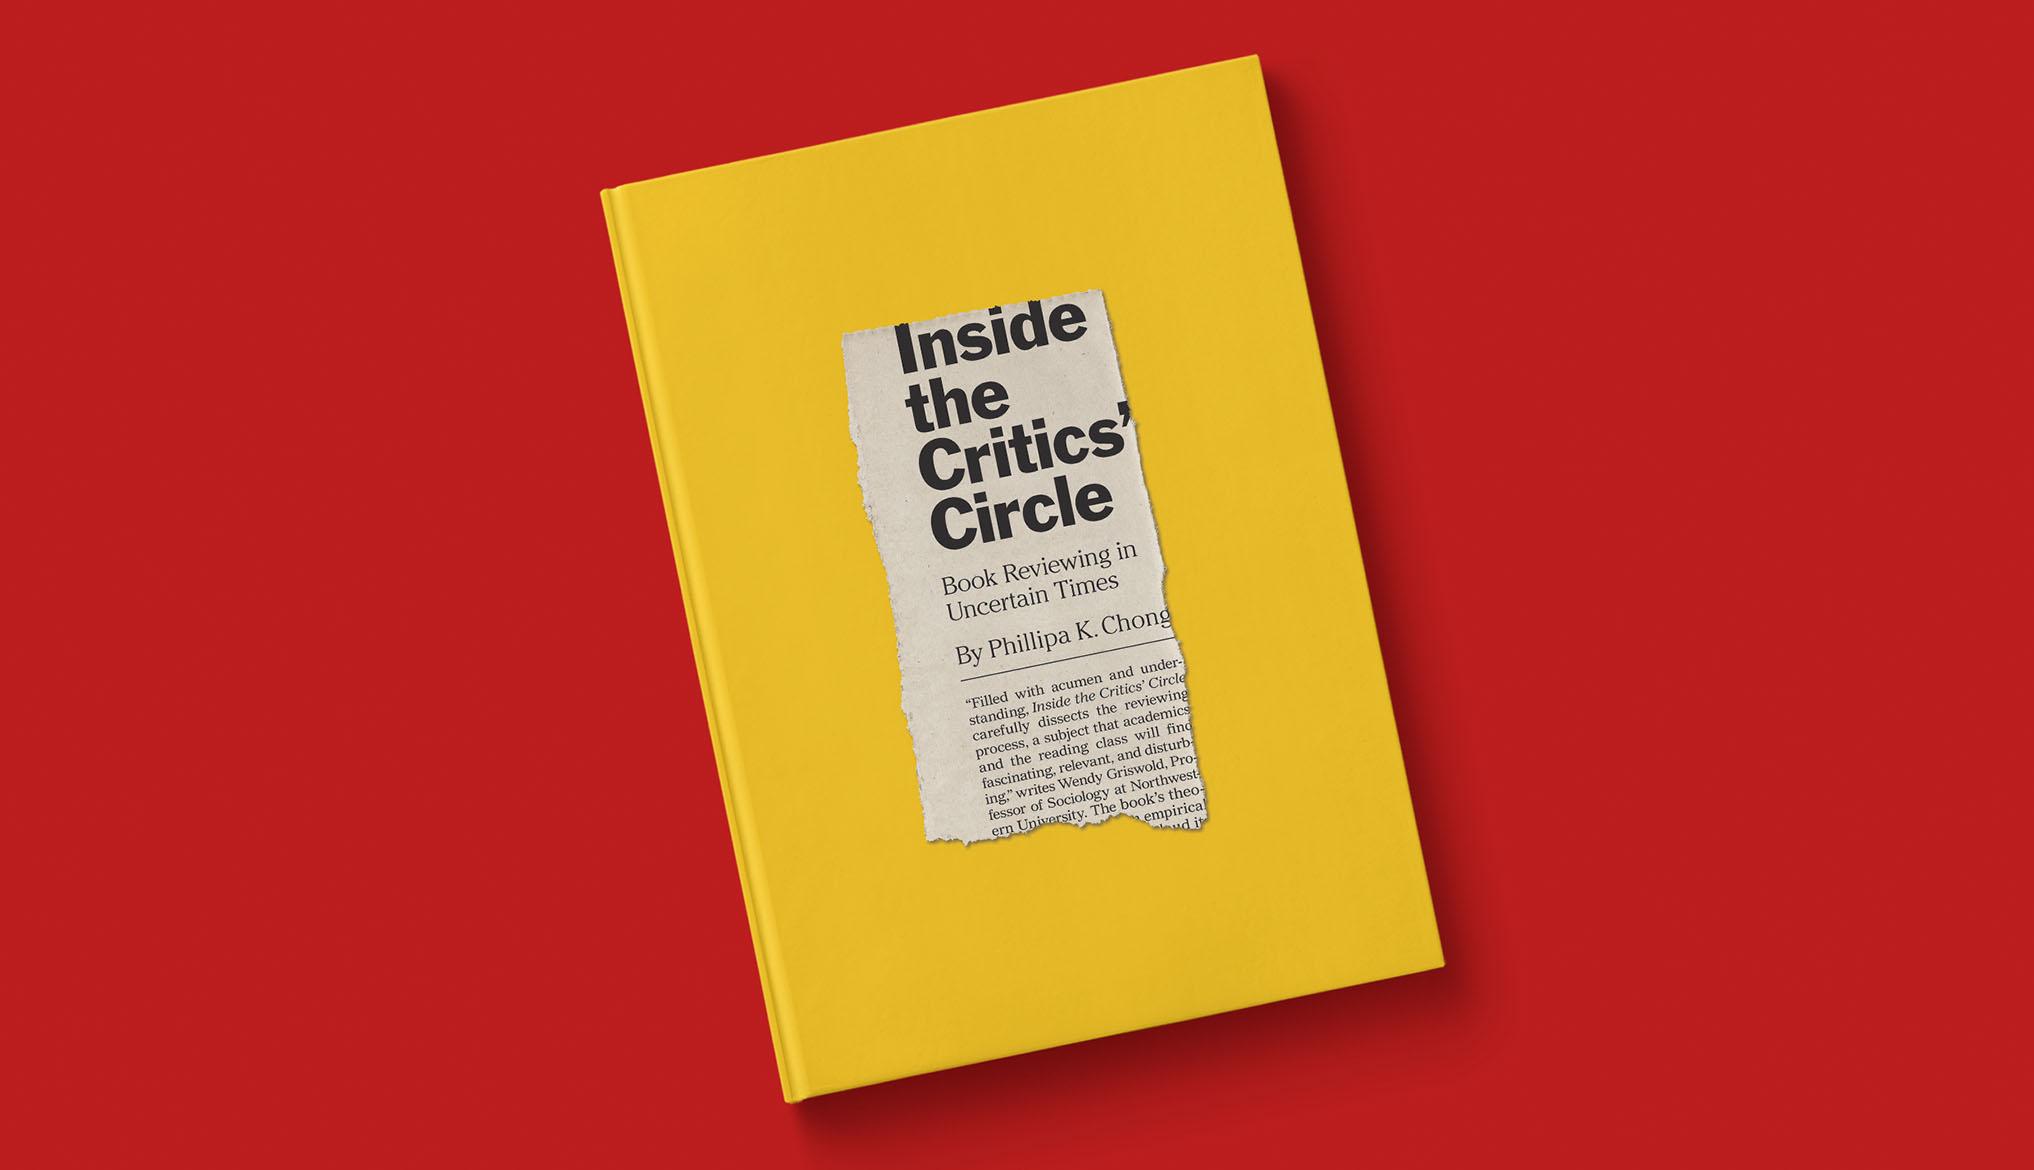 insidethecriticscircle.jpg